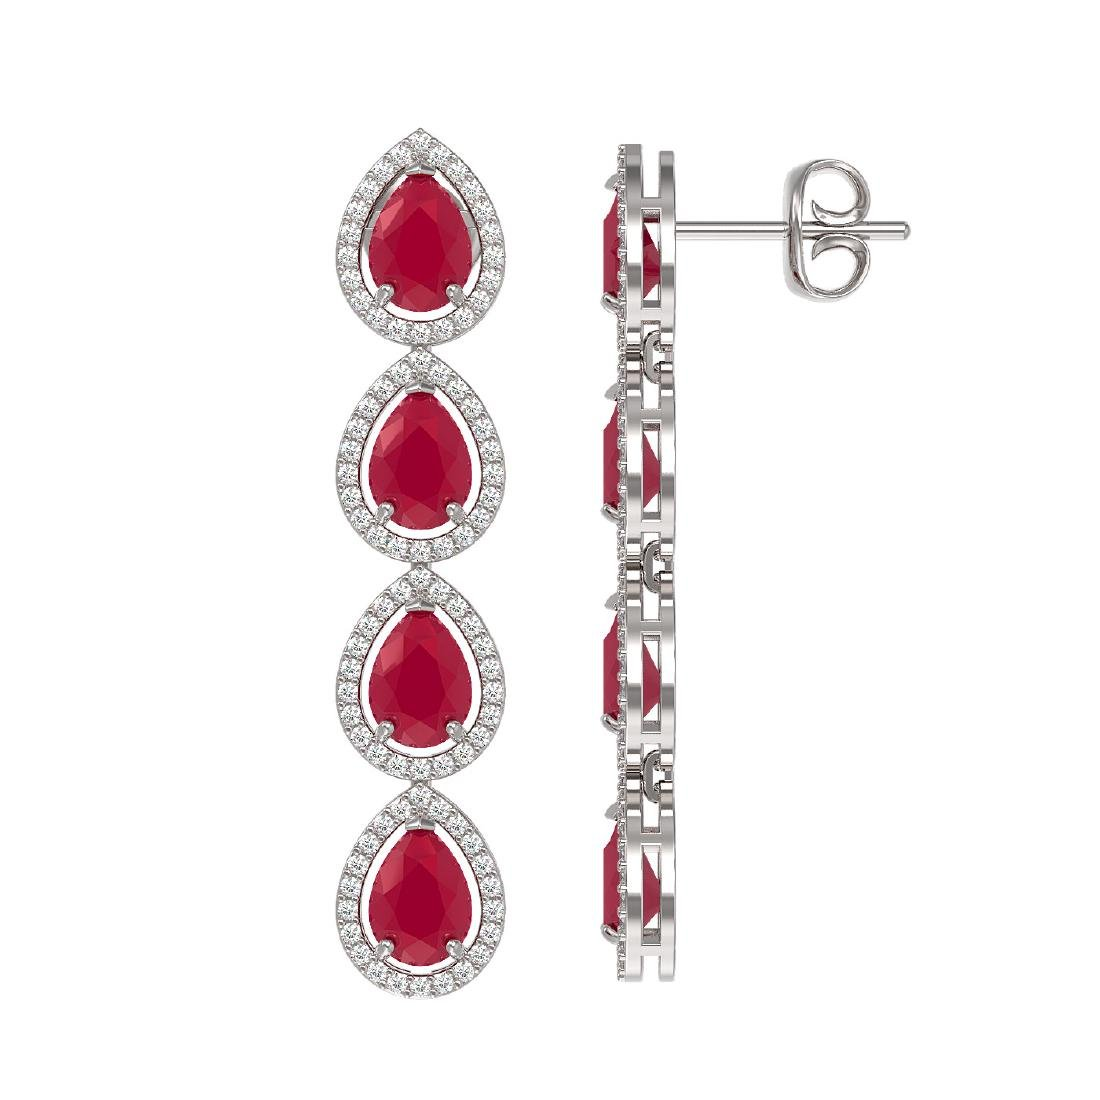 10.2 CTW Ruby & Diamond Halo Earrings 10K White Gold - 2